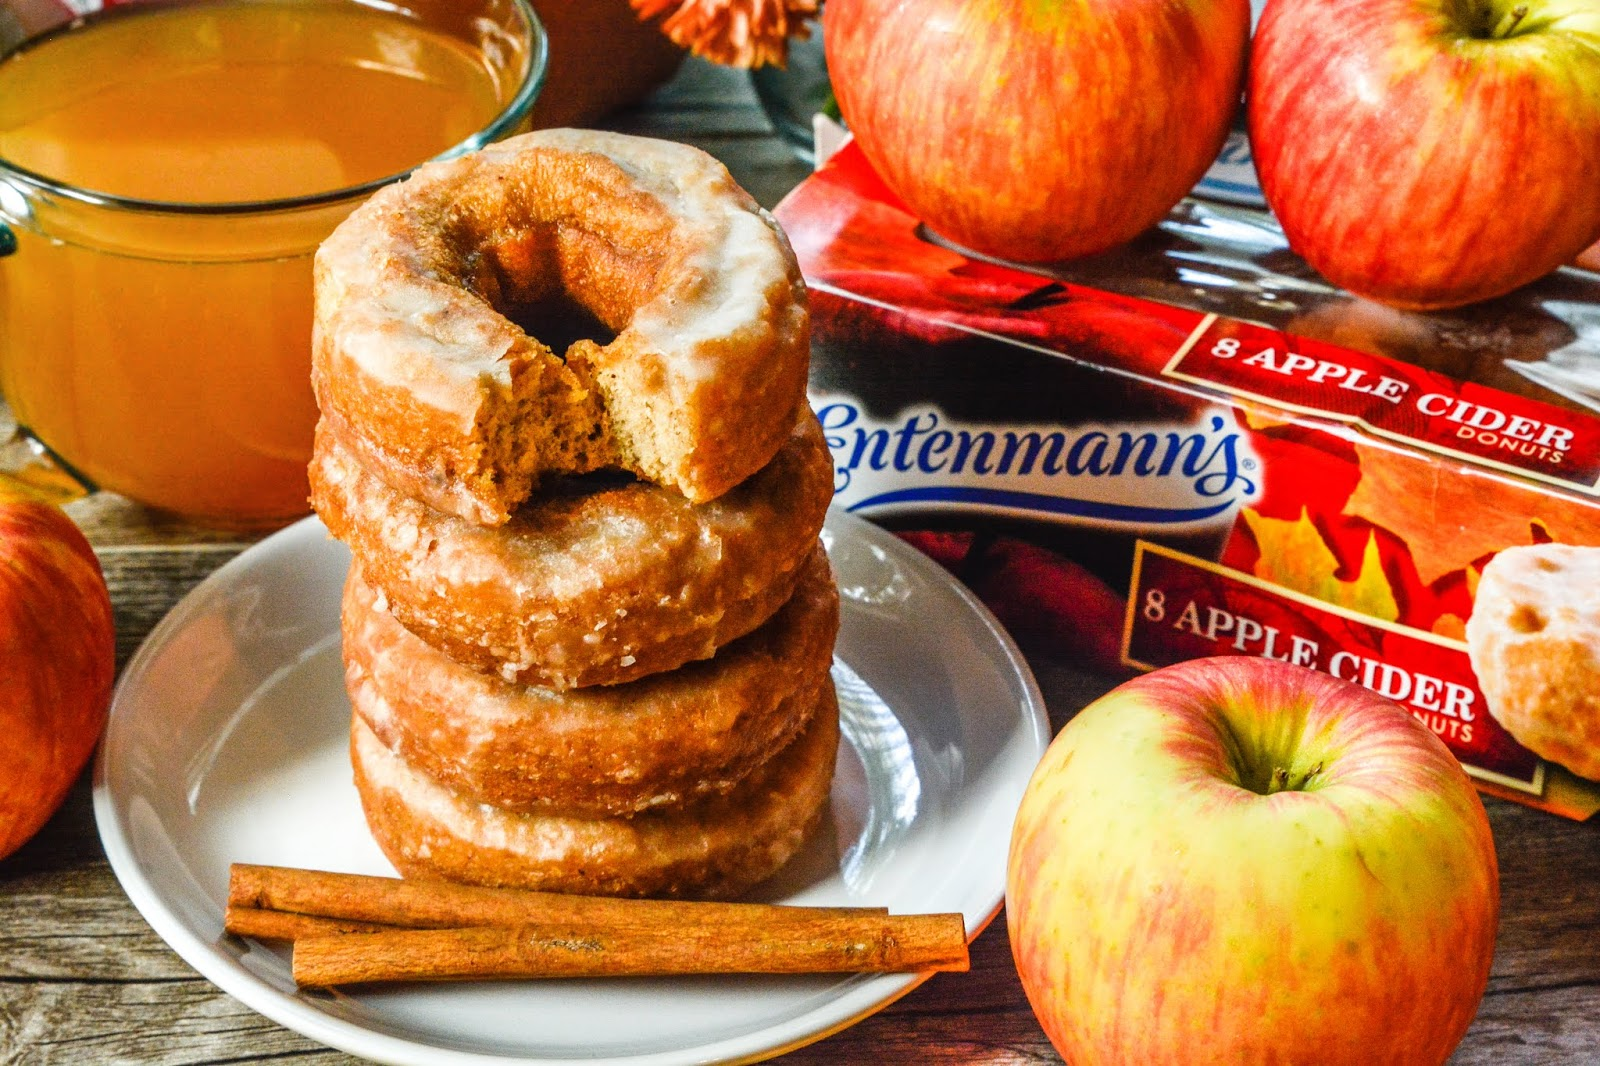 Entenmann's Apple Cider Doughnuts